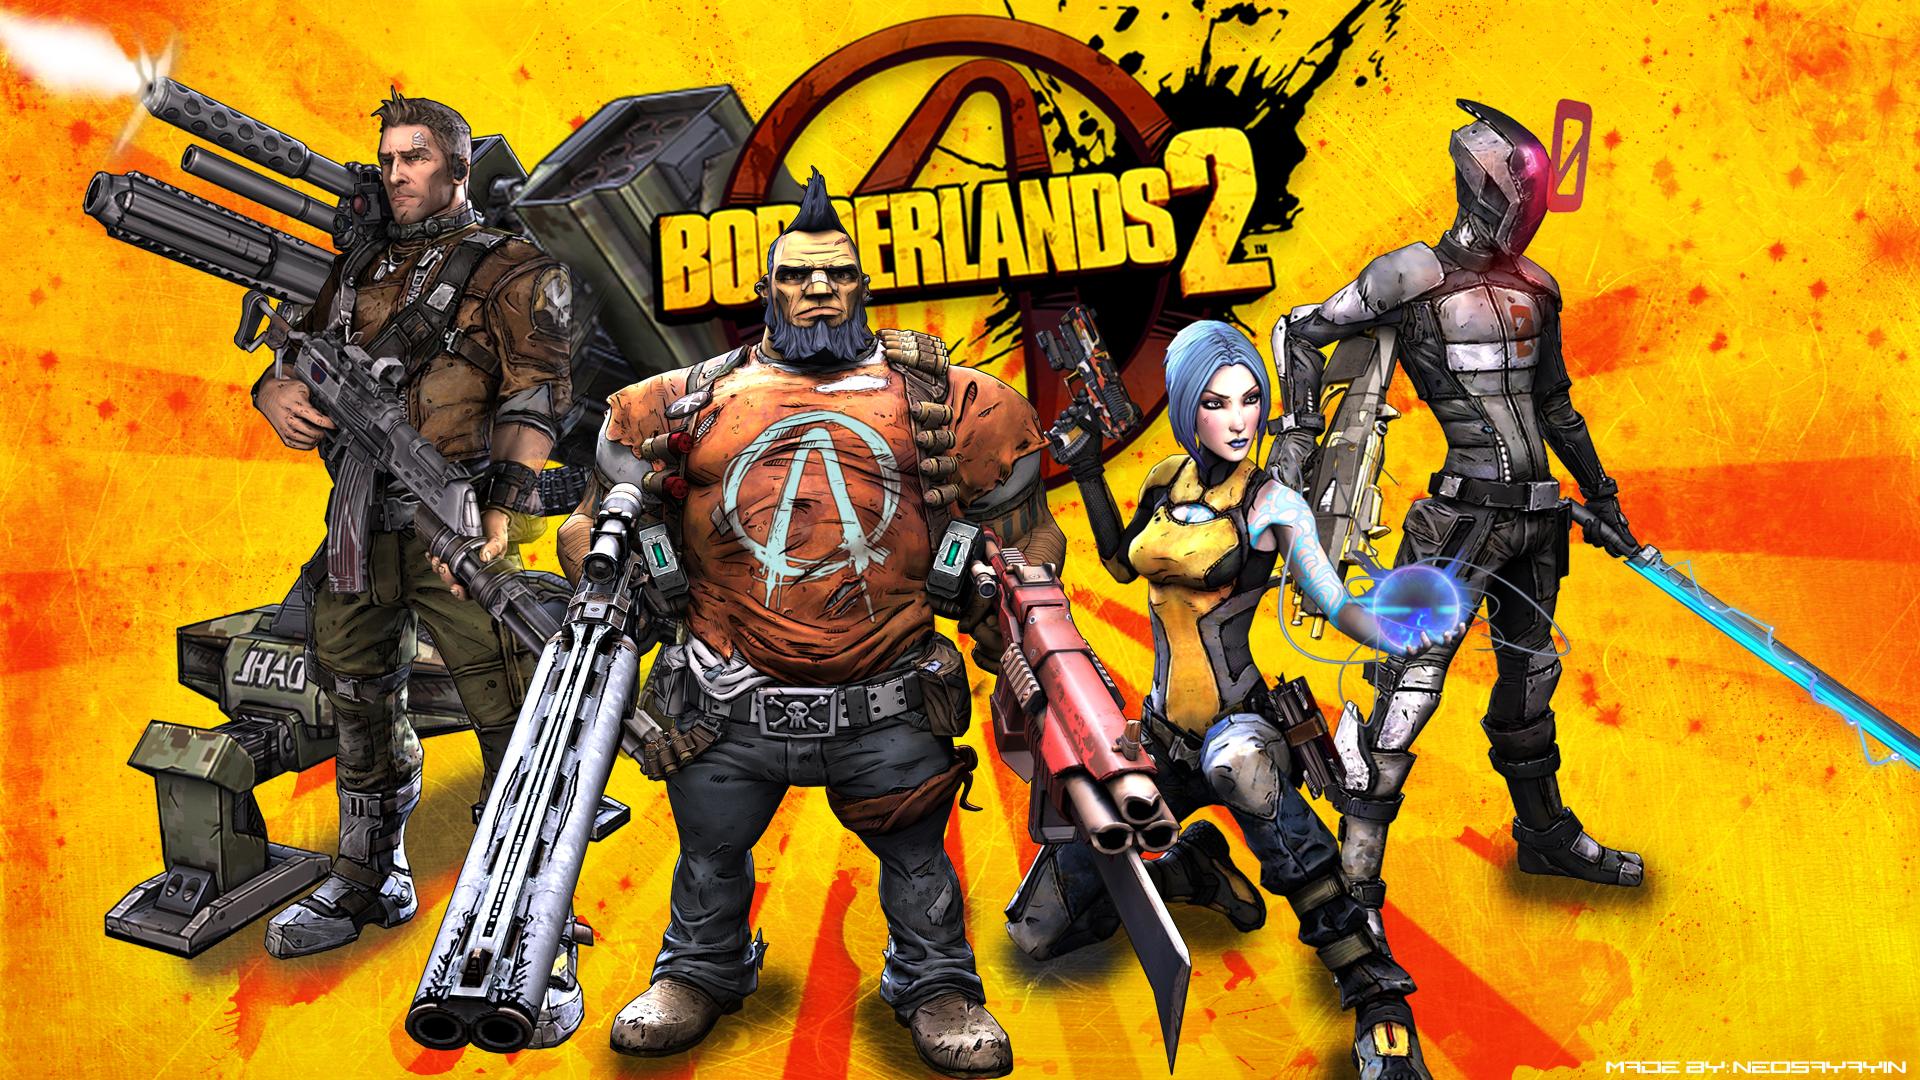 Borderlands 2 Game Wallpapers2